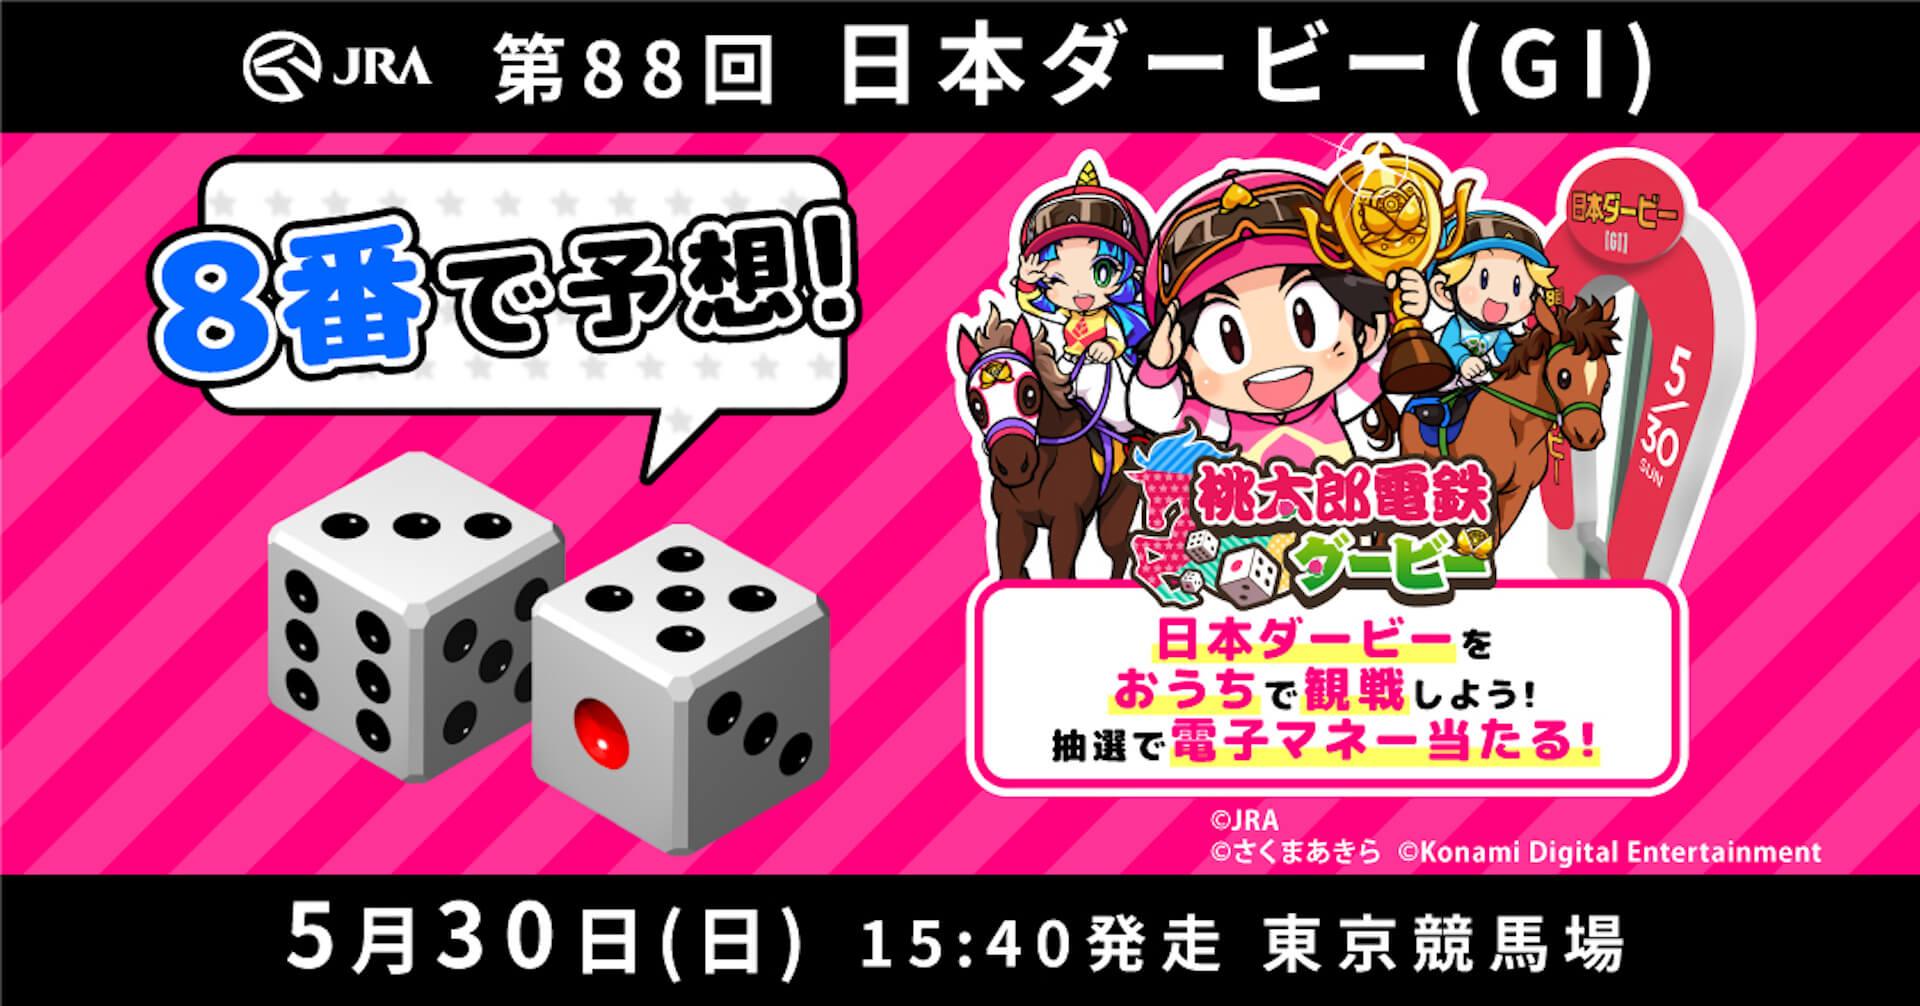 JRAと桃太郎電鉄が日本ダービーでコラボ!1万円分の電子マネーギフトが当たるTwitterキャンペーンも実施 tech210517_jra-momotetsu-210517_9